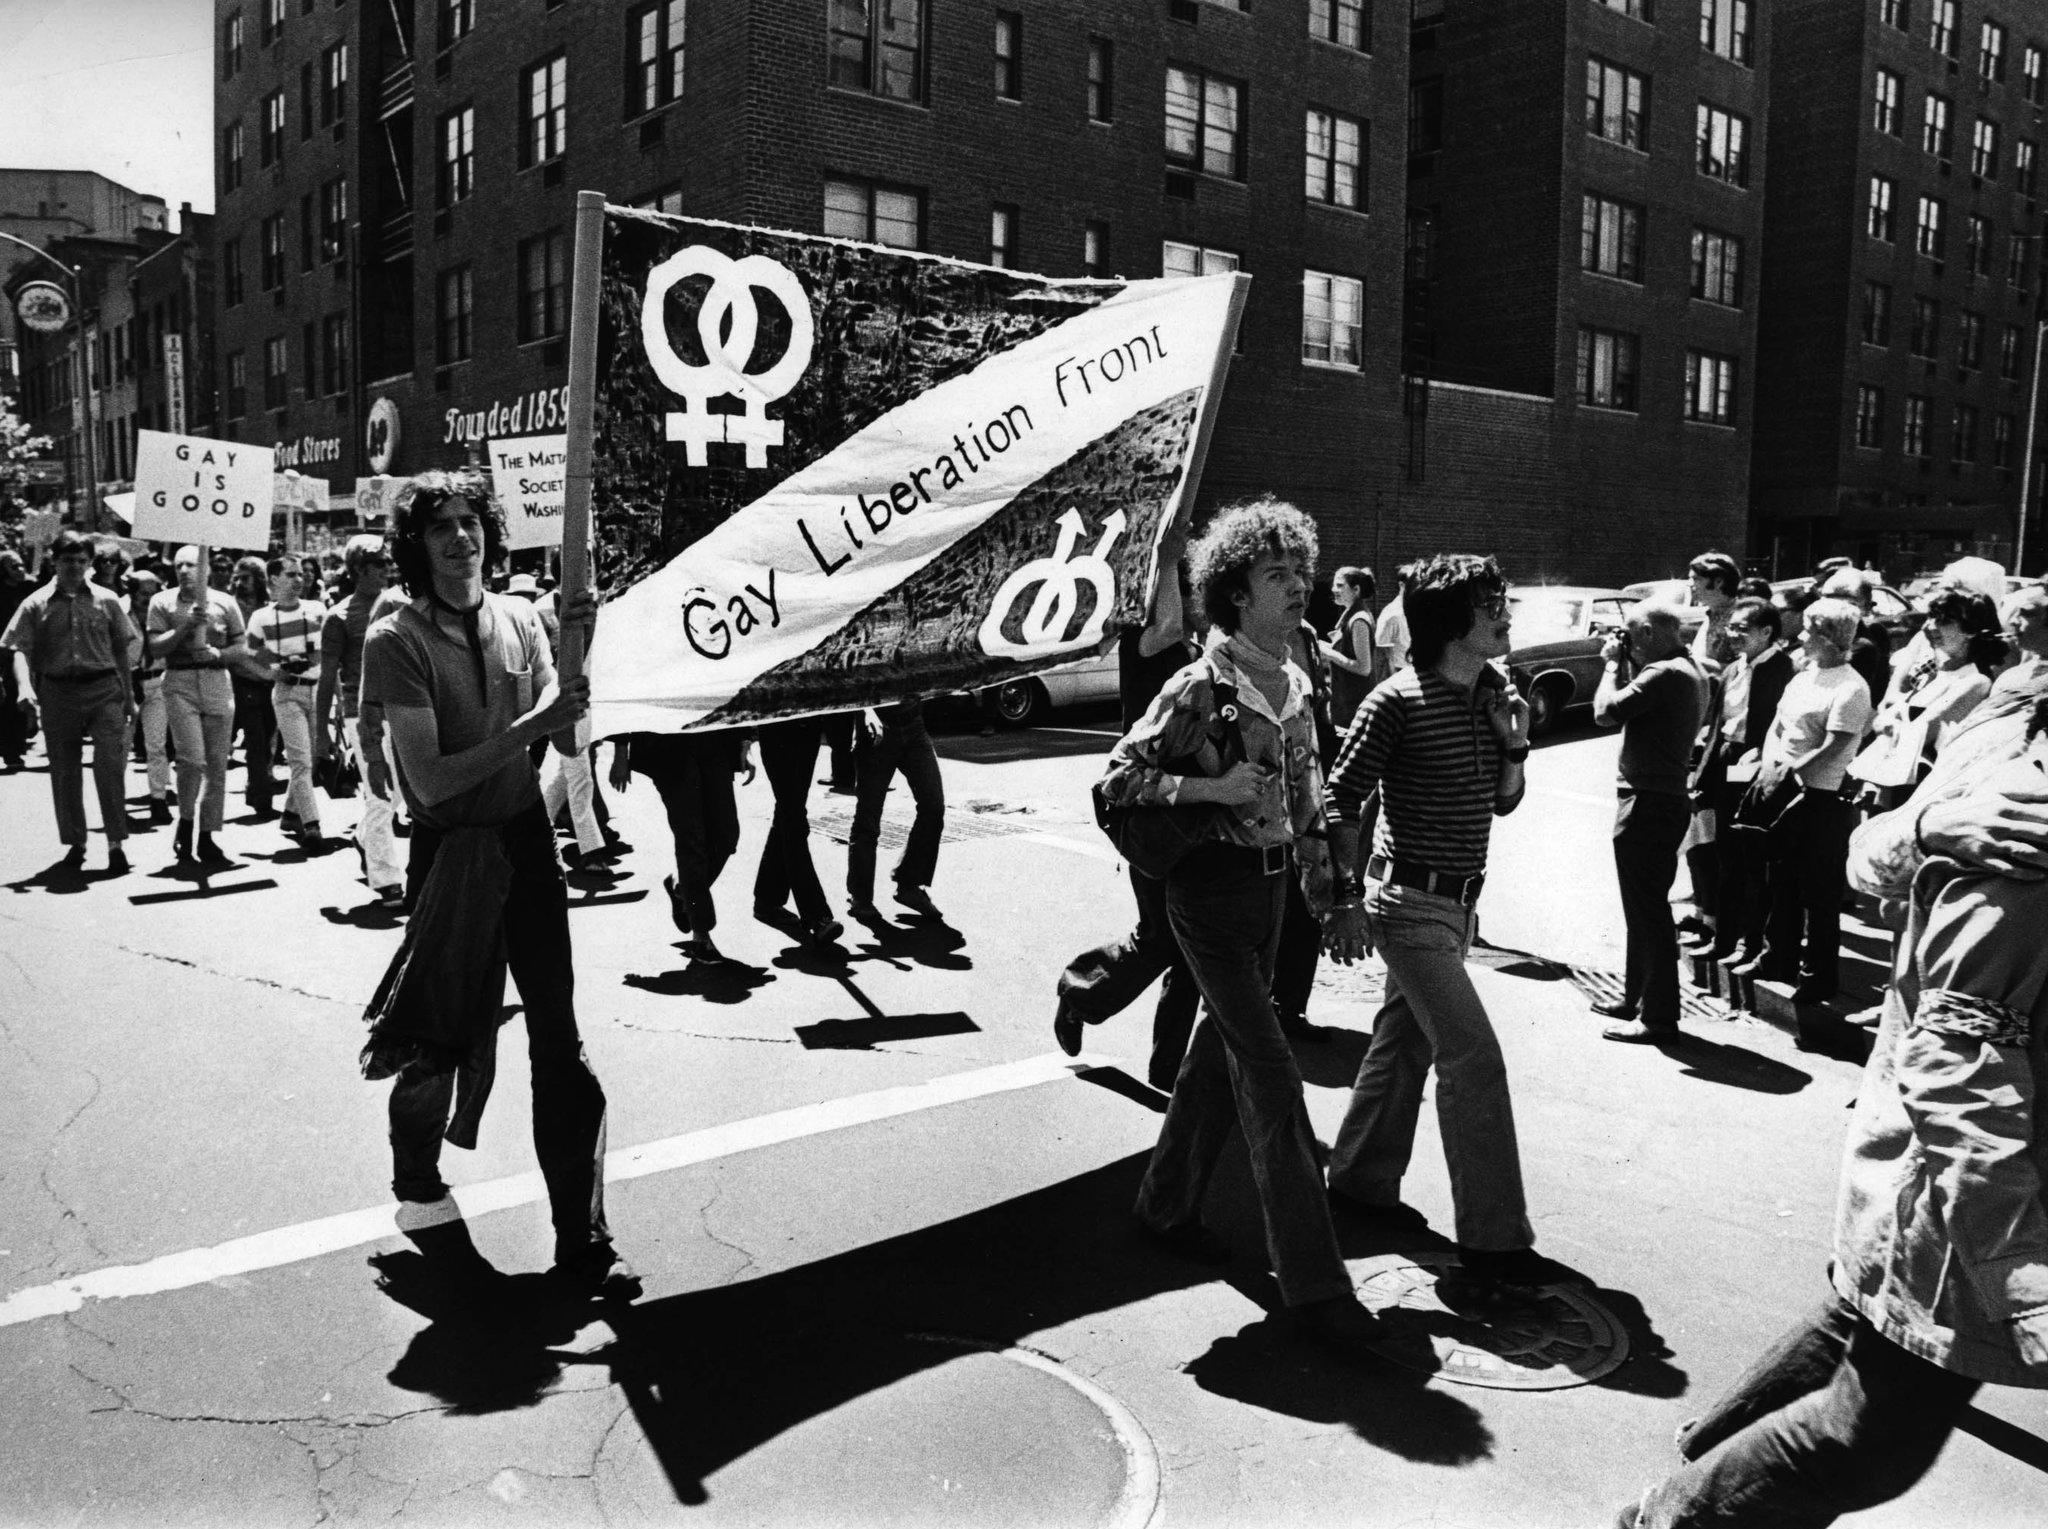 America build gay in movement right struggle